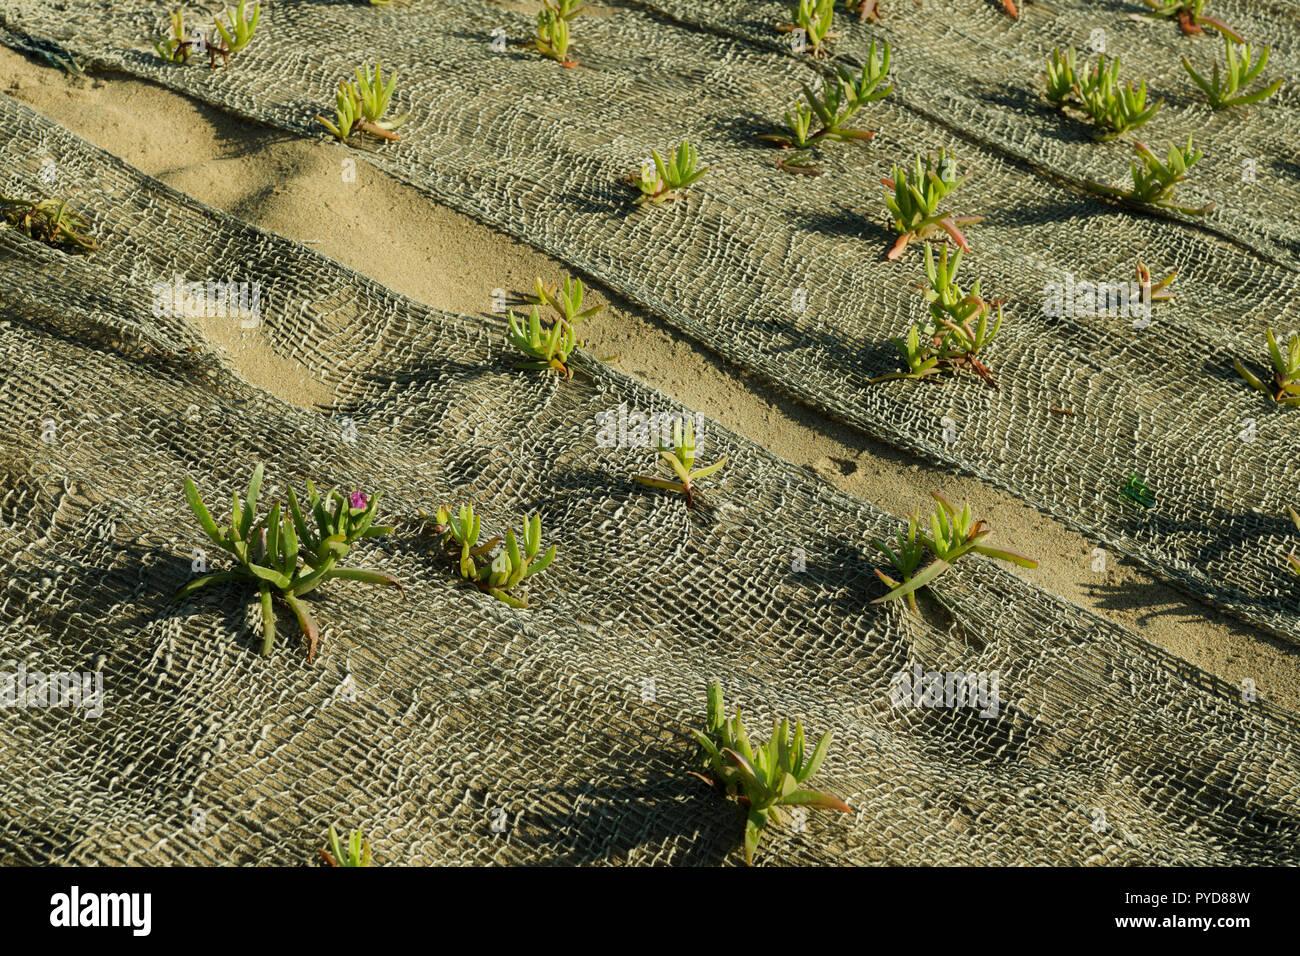 Durban, KwaZulu-Natal, South Africa, close up, Natal Dune Vygie, Carpobrotus edulis, in natural material netting, stabilise sand, dune rehabilitation Stock Photo